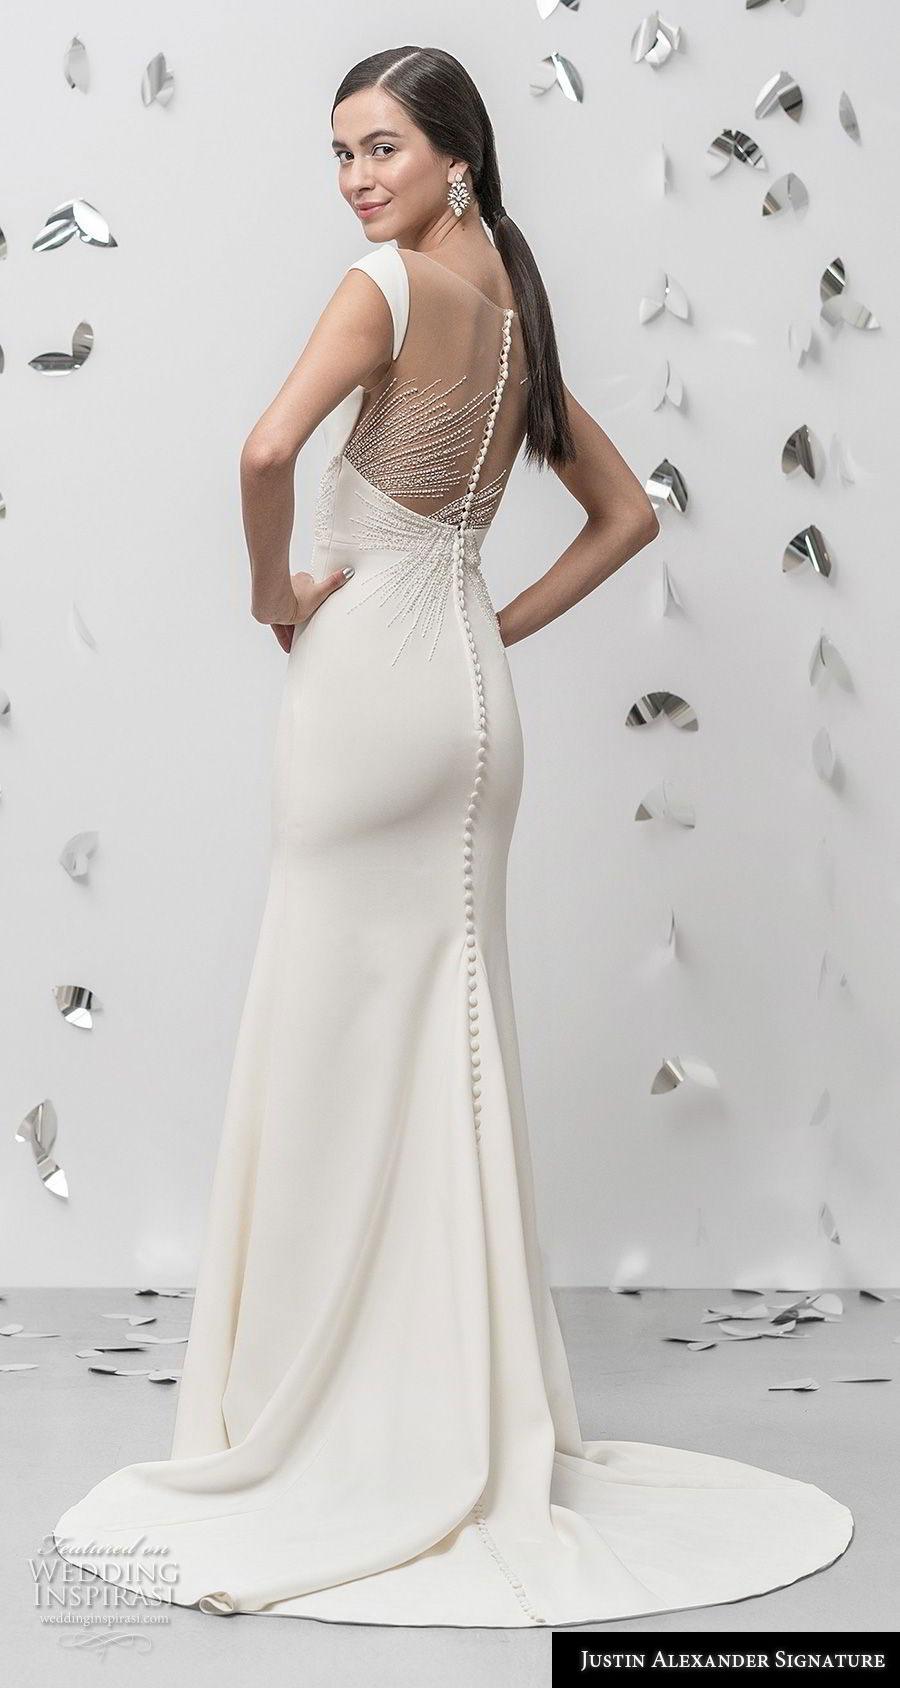 justin alexander fall 2018 signature cap sleeves bateau neck simple minimalist elegant sheath wedding dress sheer button back short train (20) bv